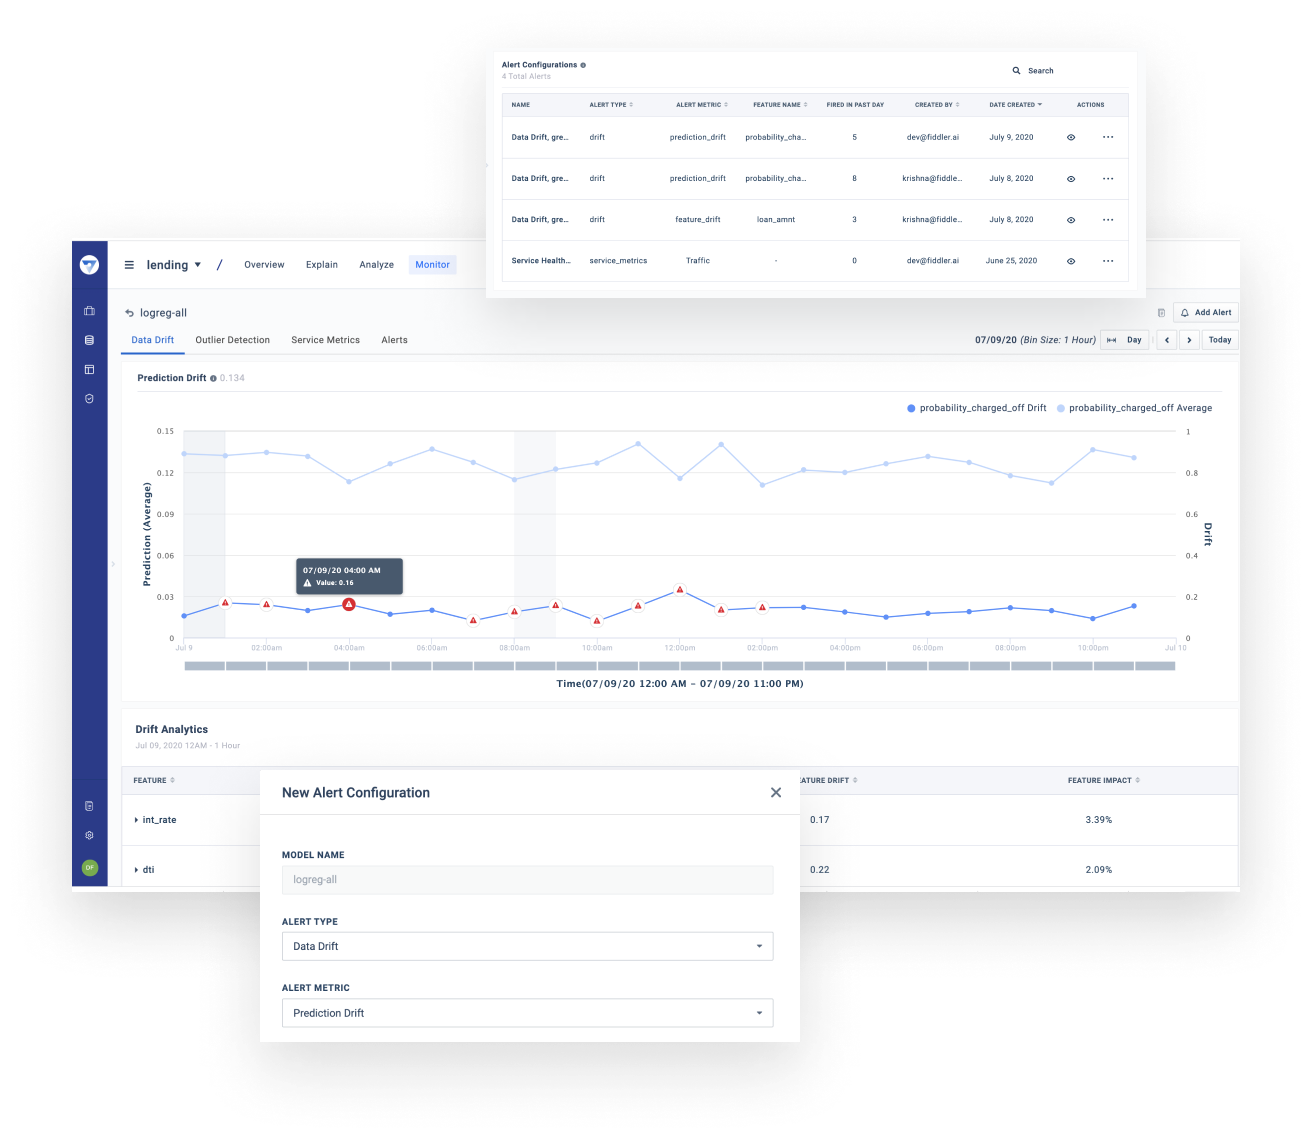 An image of Fiddler's ML MPM Platform dashboard. It shows how a user can configure alerts when data drift occurs.